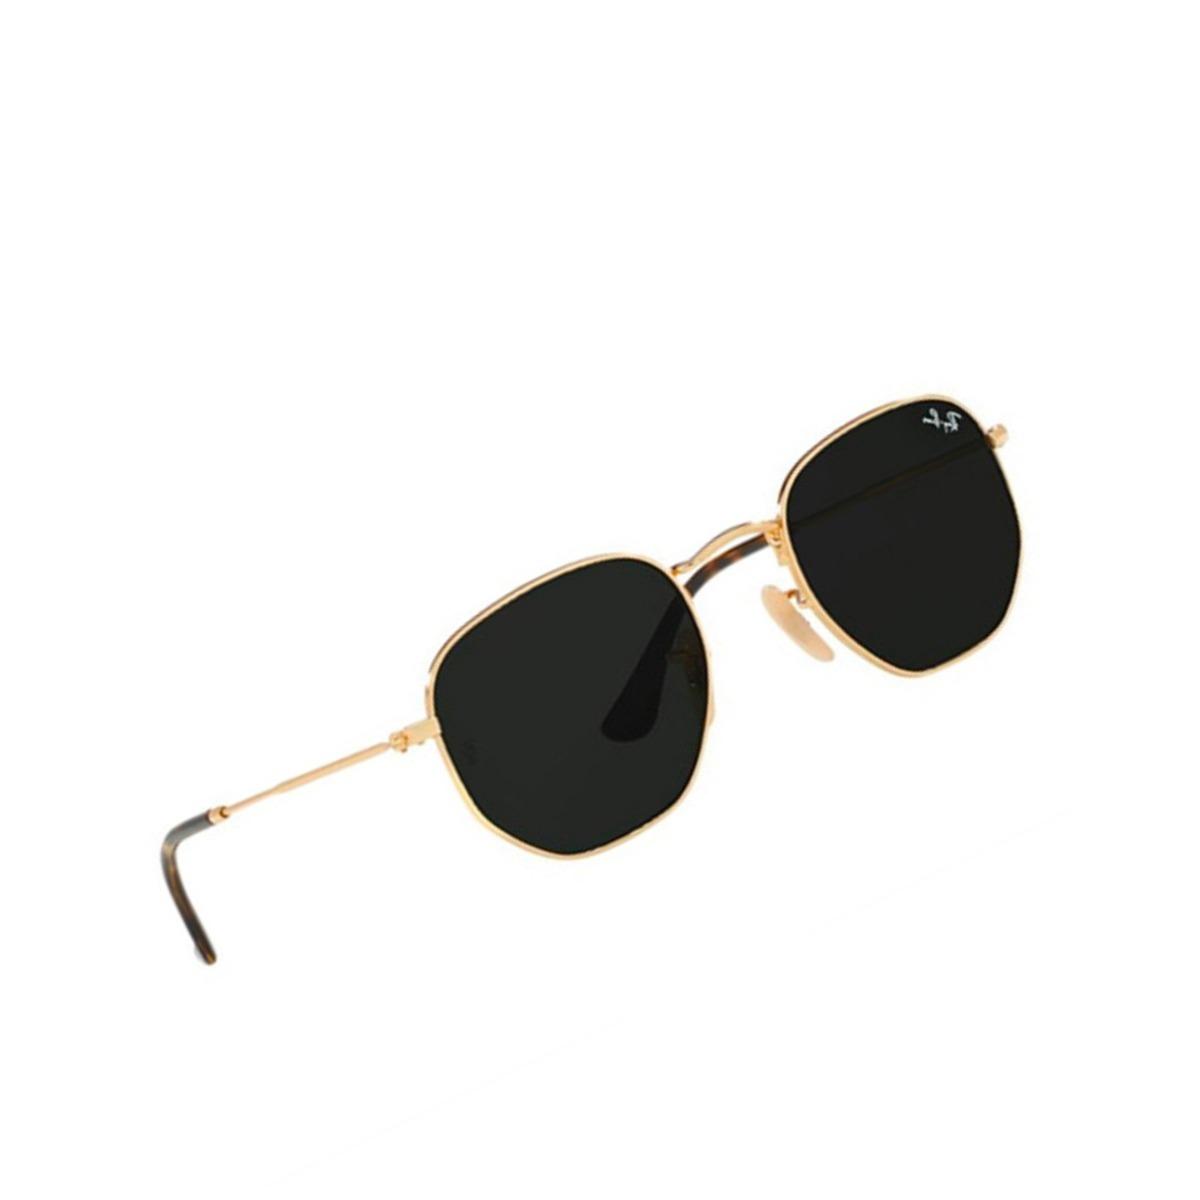 f014daeea01e3 óculos de sol estilo hexagonal feminino - masculino. Carregando zoom.